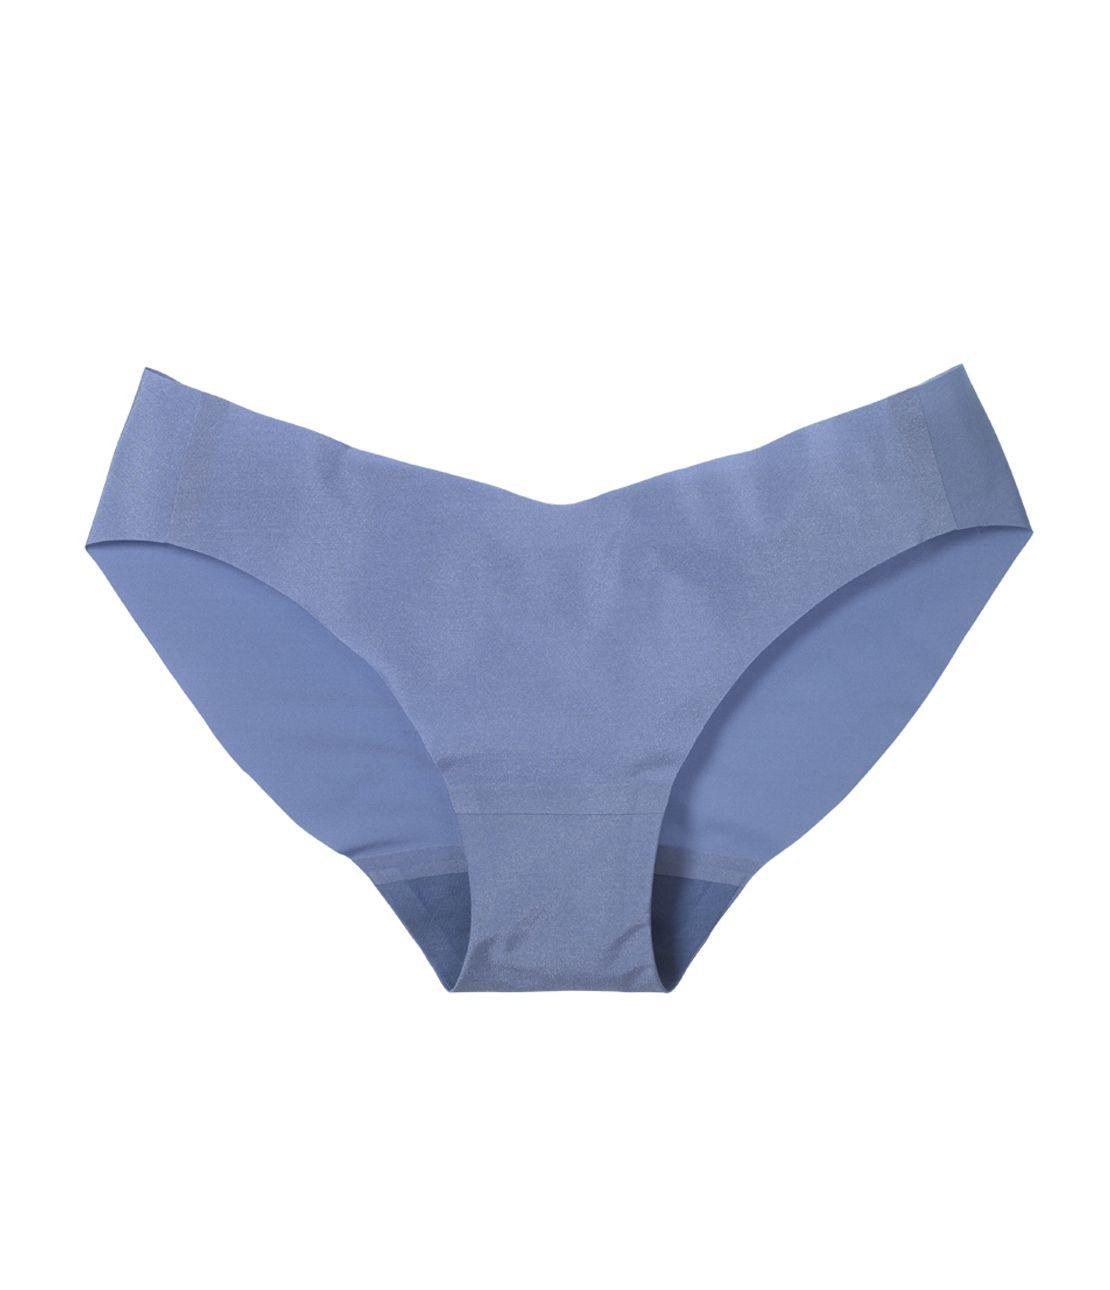 PJ model's Bikini Bottom